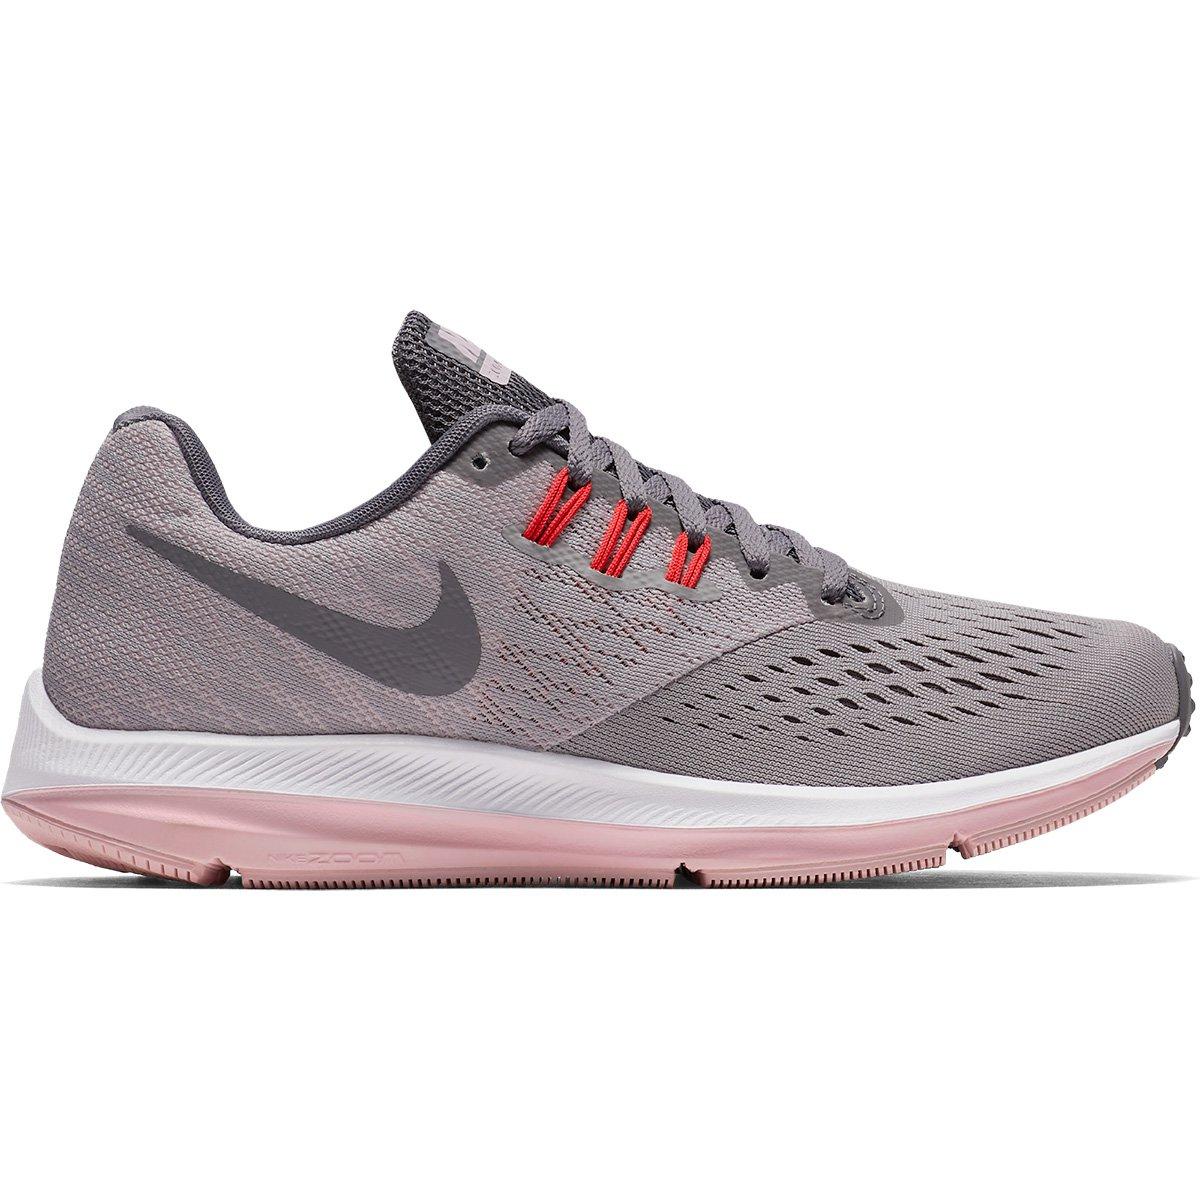 456cf24db1 Tênis Nike Zoom Winflo 4 Feminino